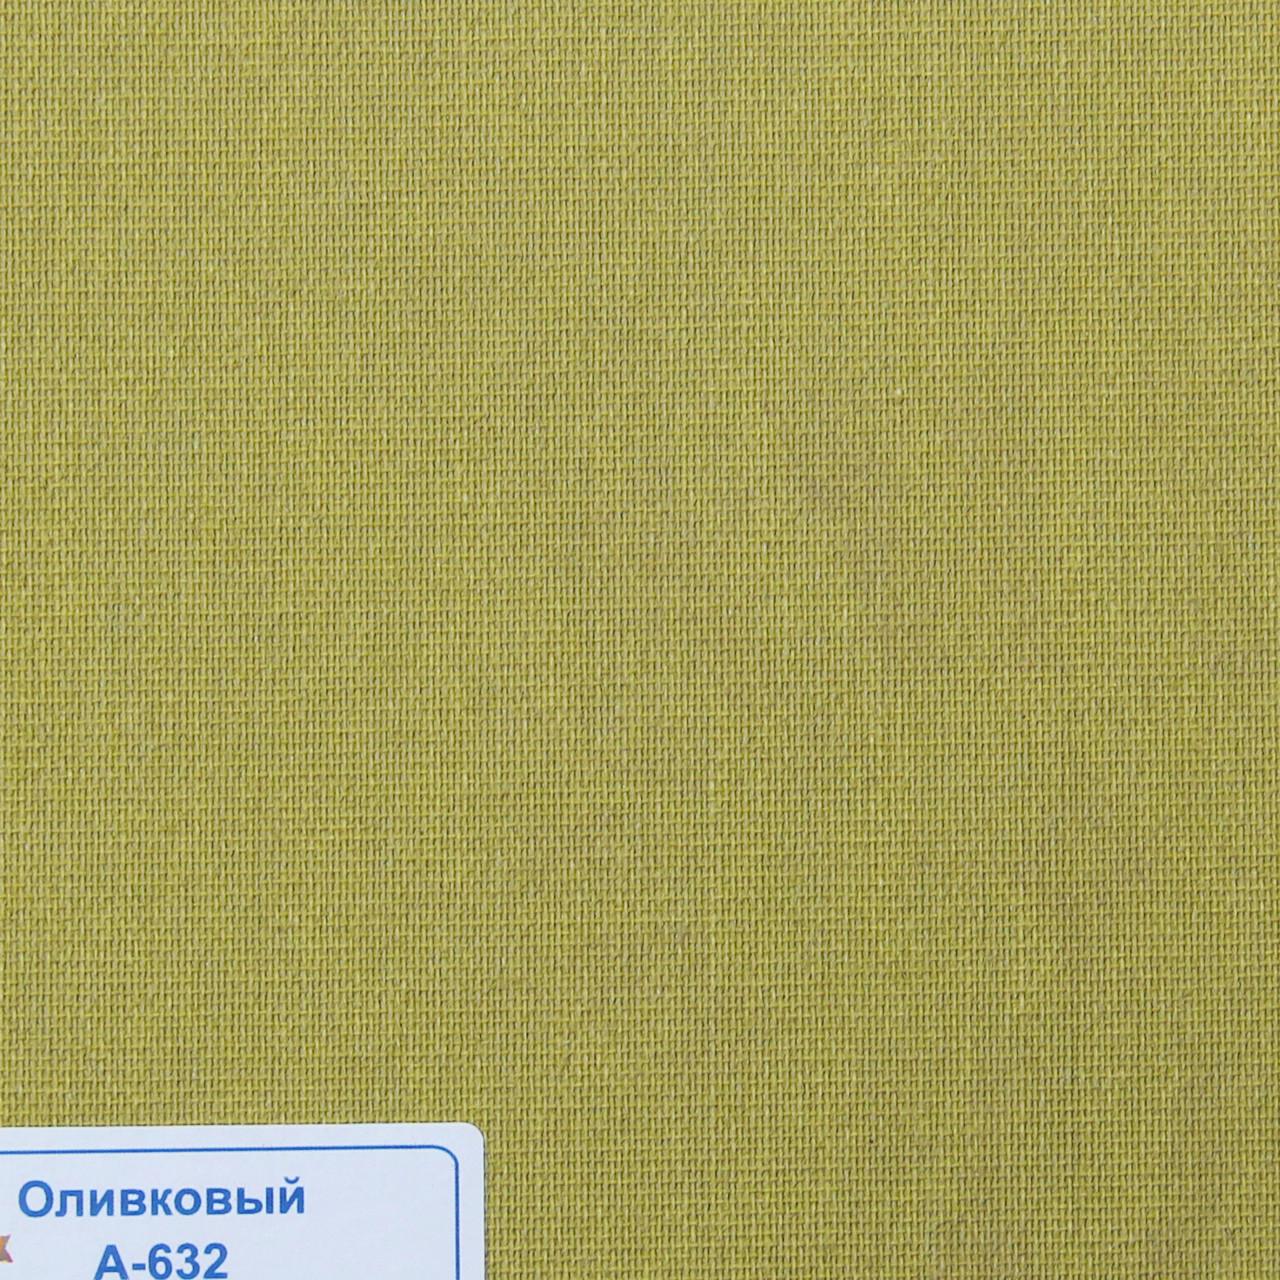 Рулонные шторы Ткань Однотонная А-632 Оливковый